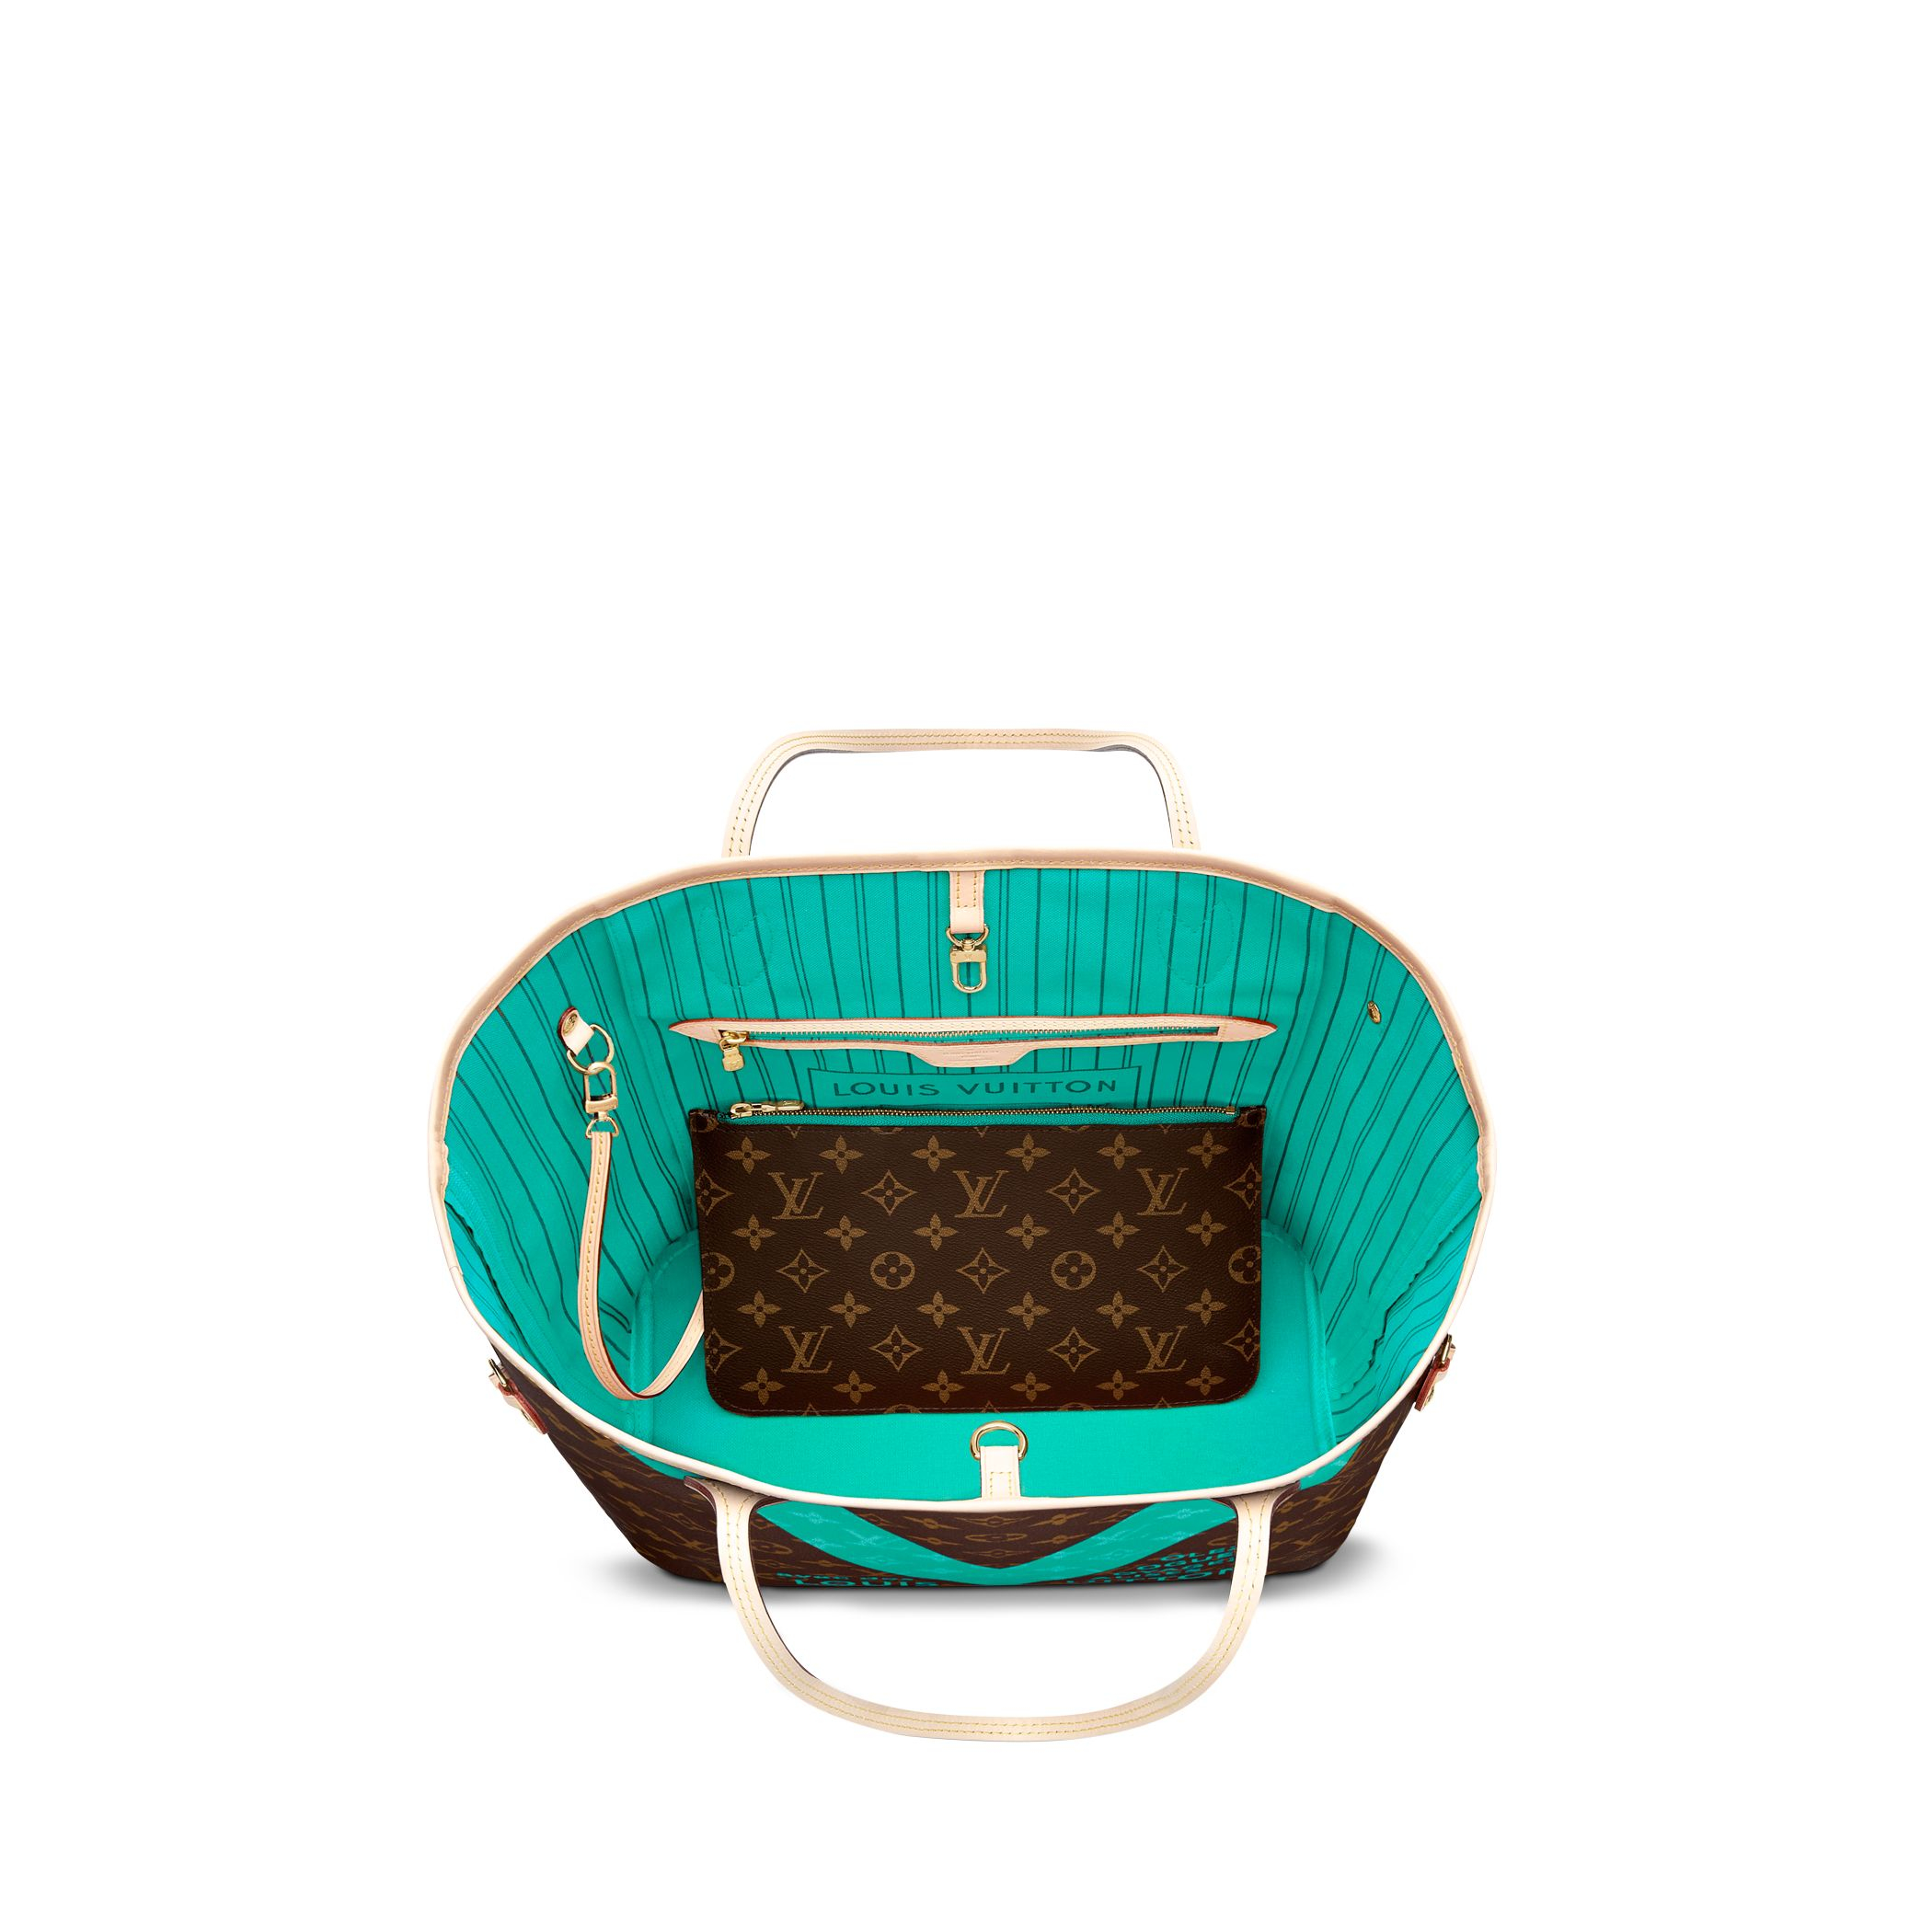 Sac A Main Louis Vuitton Neverfull Mm - Helen Connors Blog 95e43eb96af